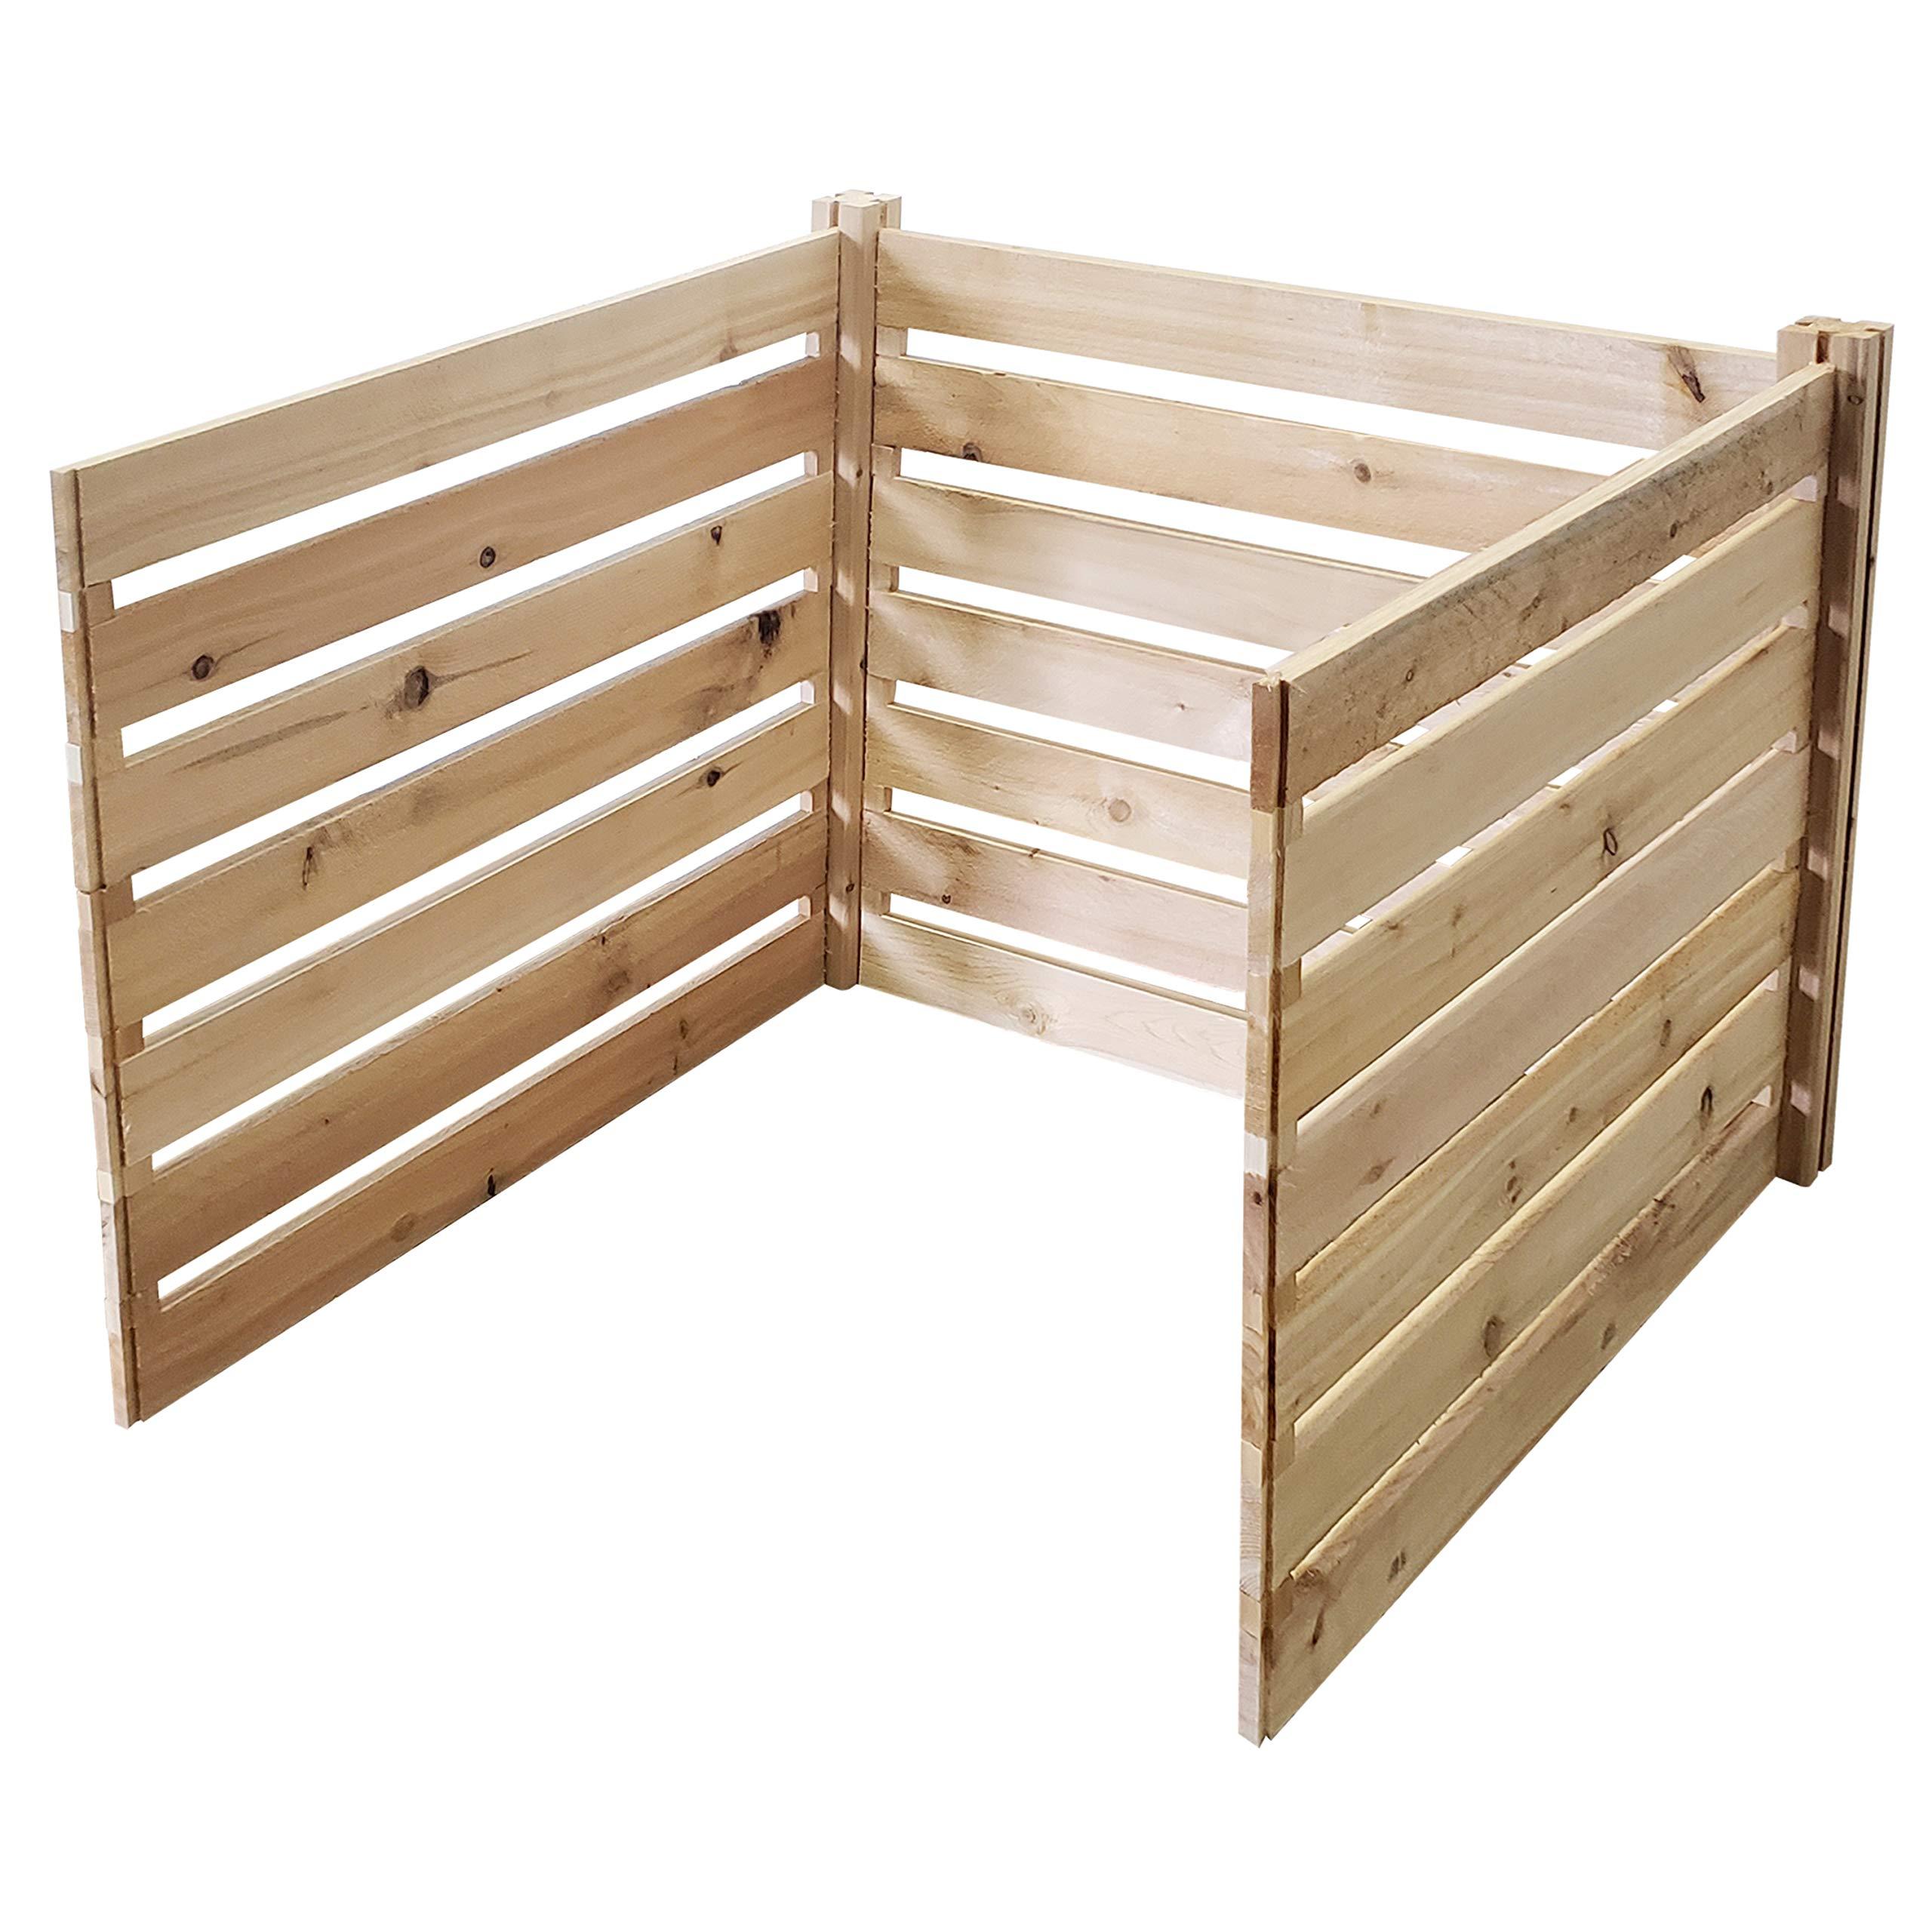 Greenes Fence RCCOMP36ADK Cedar Wood Composter Add-On Kit, 36'' L x 36'' W x 31'' H / 173.92 gallons by Greenes Fence